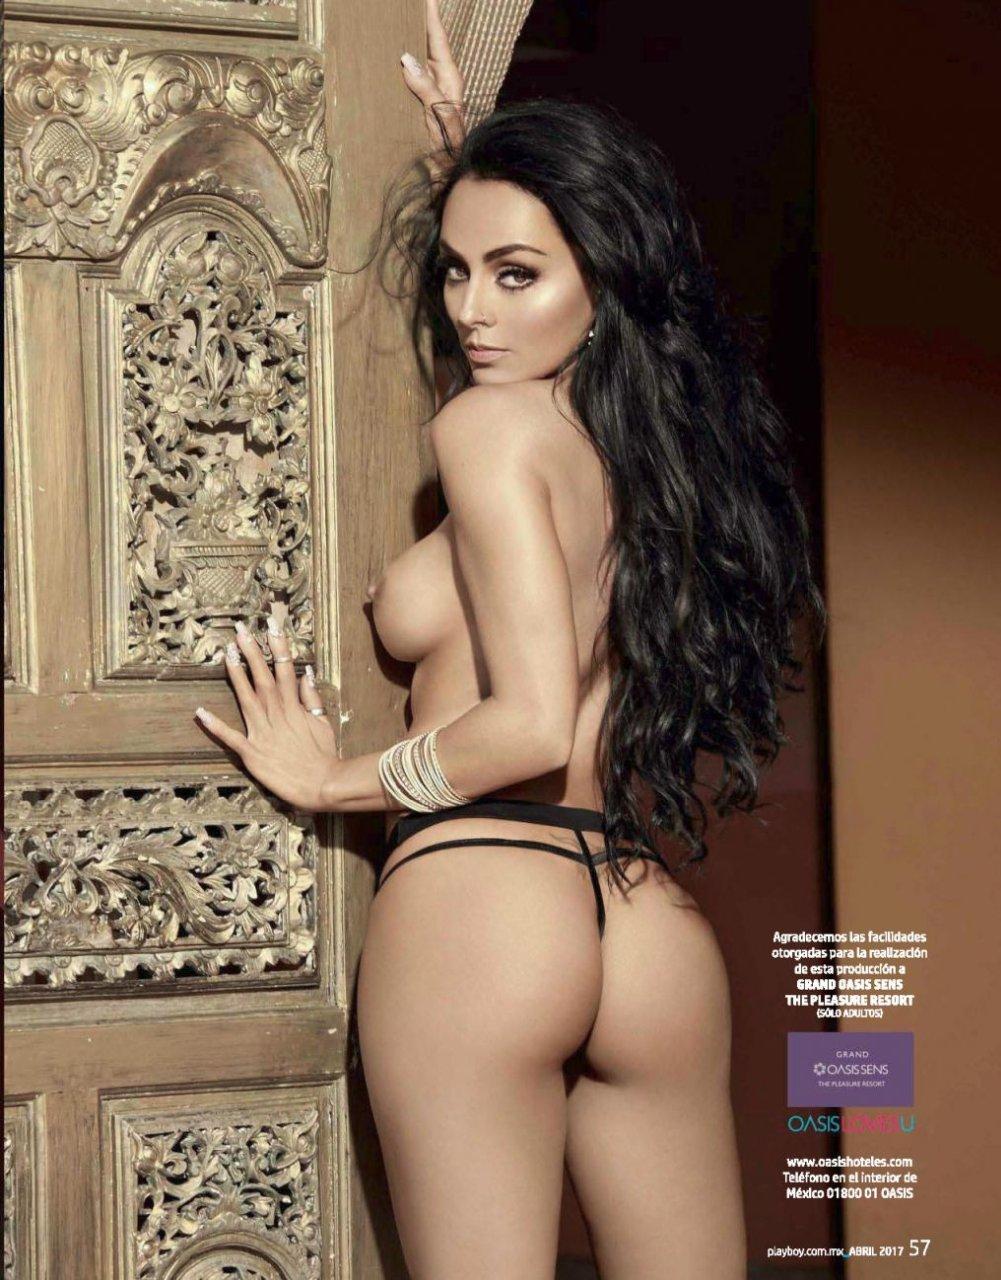 Sex Ivonne Montero nude photos 2019